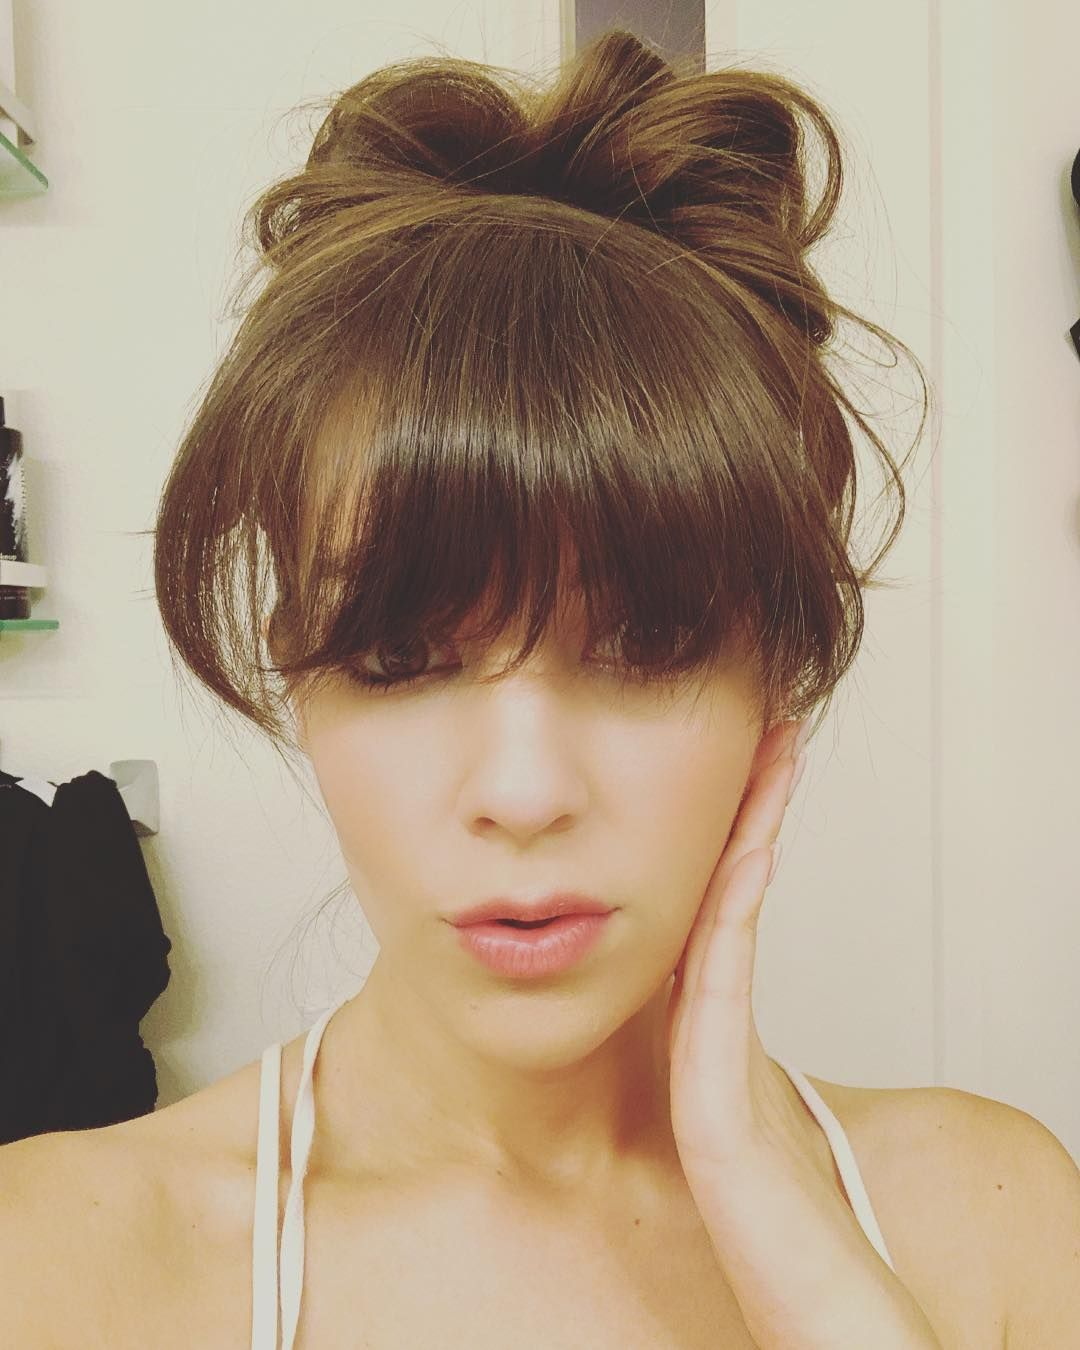 "Photo of @macaroneer on Instagram: ""When your #bangs go full #anime ?. #nerd #messybun #bun #hair #hairstyle #wengirl #wen #selfie #wenbychazdean #annaleefiorino #la…"""